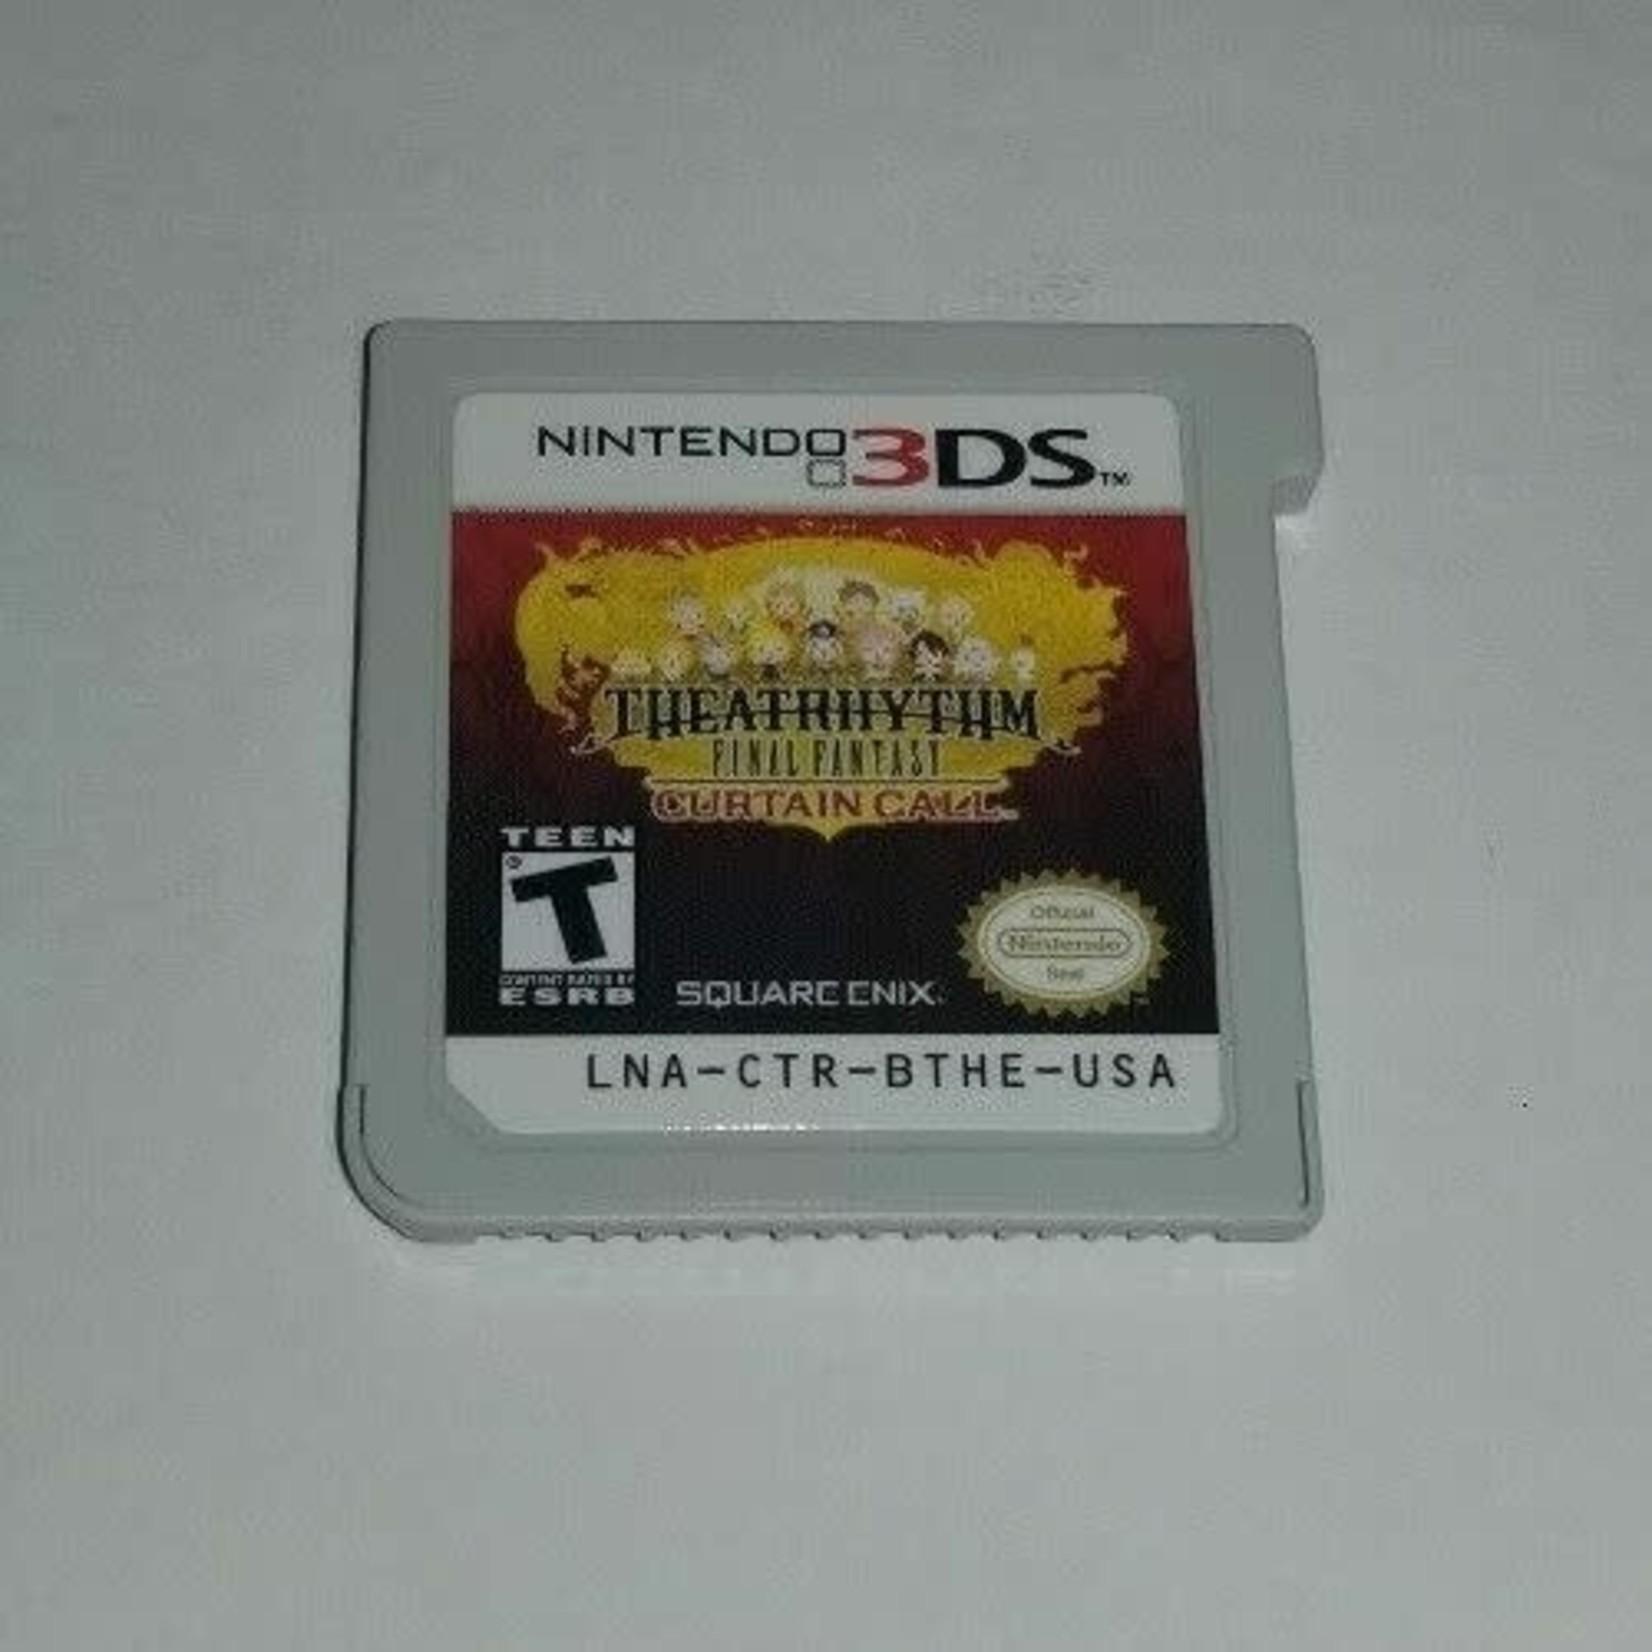 3dsu-Theatre Rythm Final Fantasy Curtain Call (cartridge)